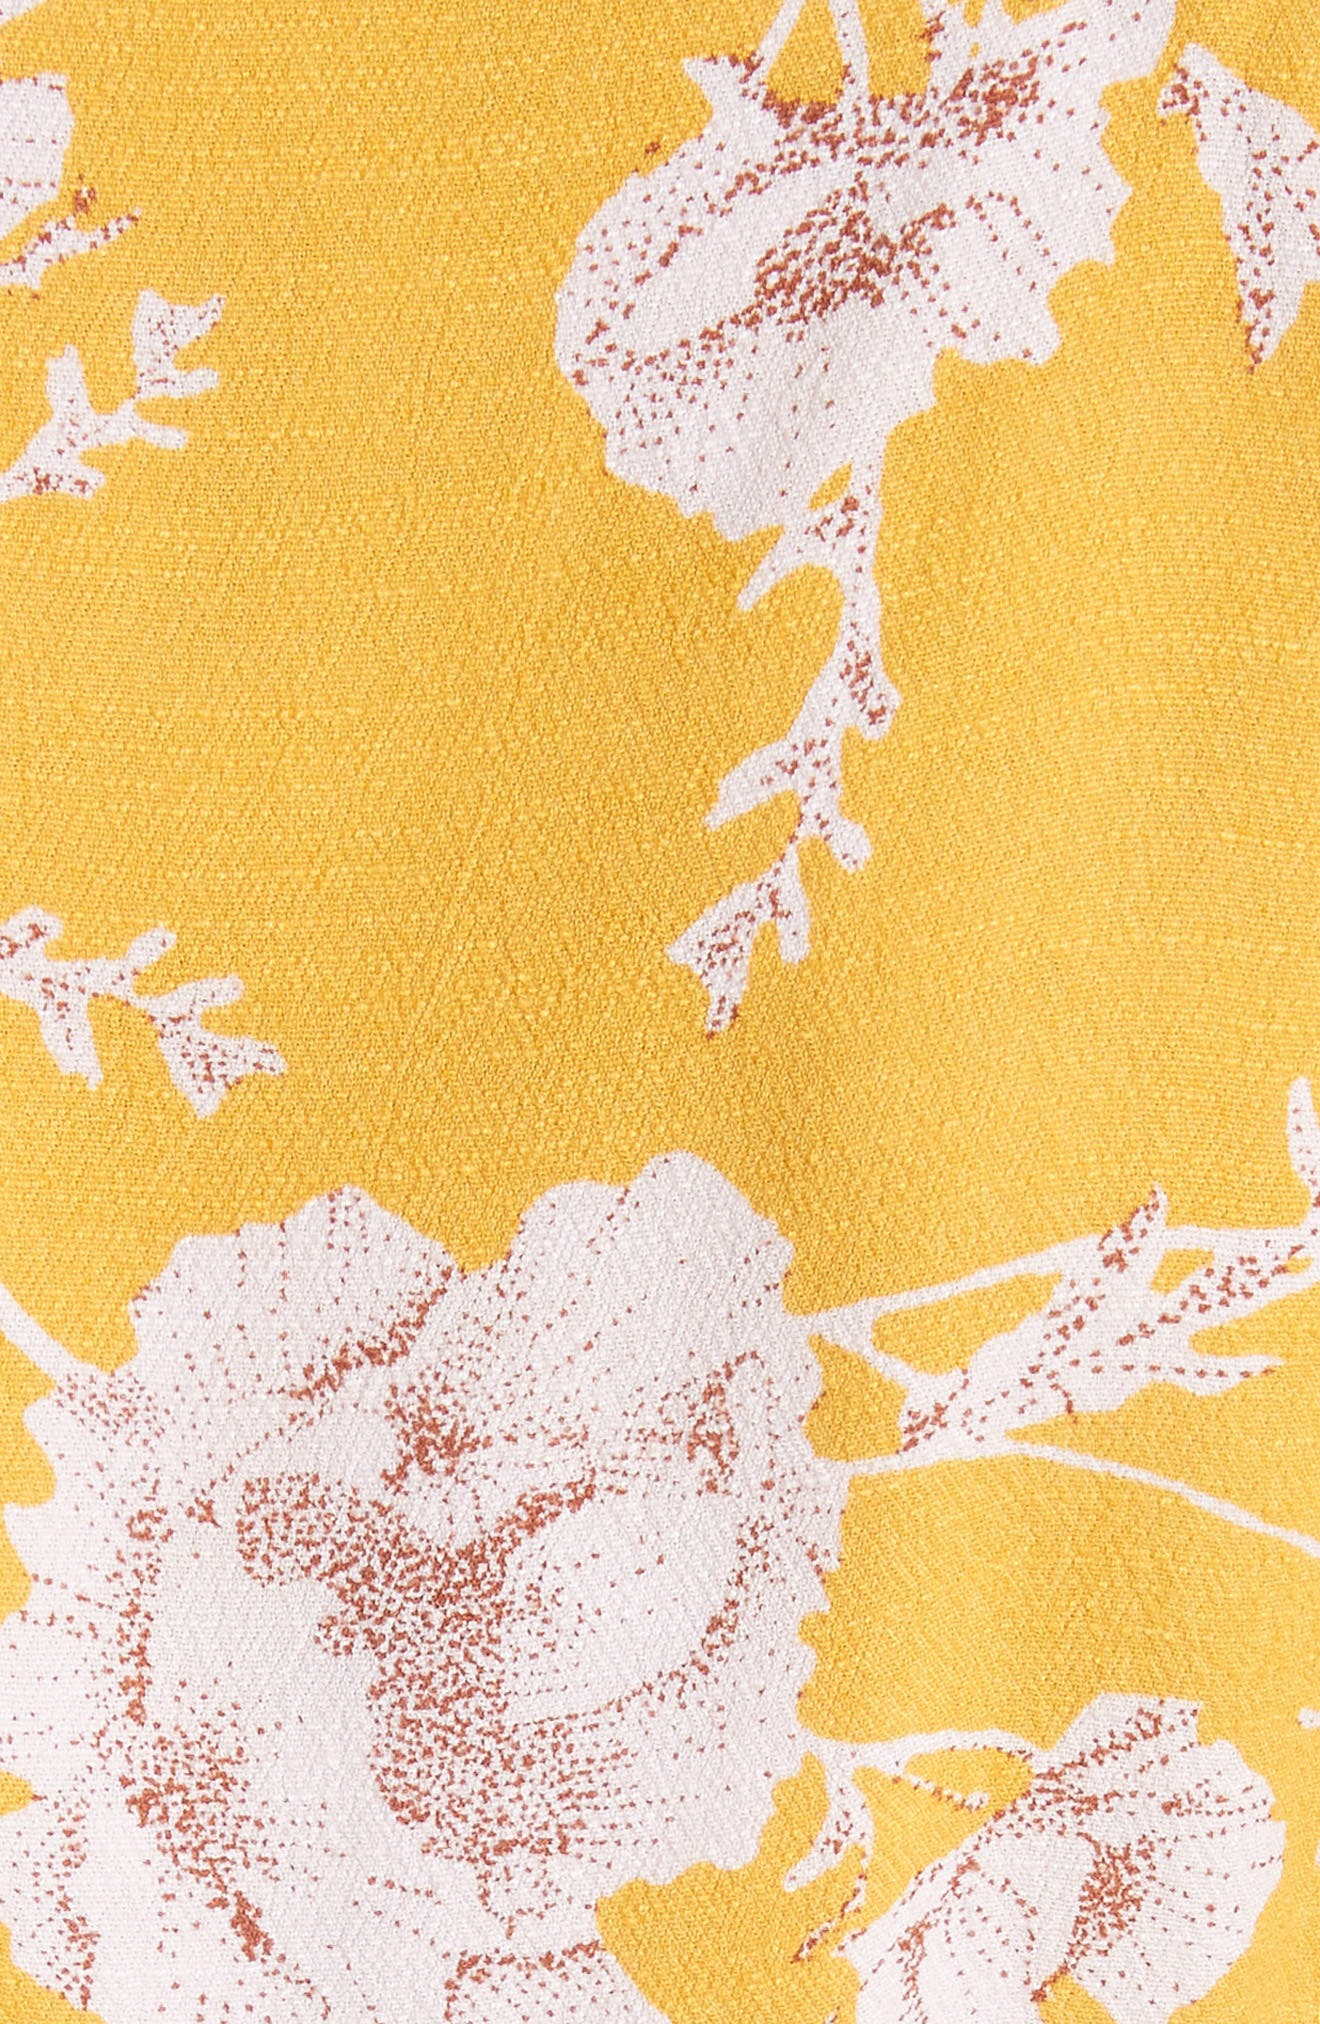 French Quarter Print Wrap Minidress,                             Alternate thumbnail 23, color,